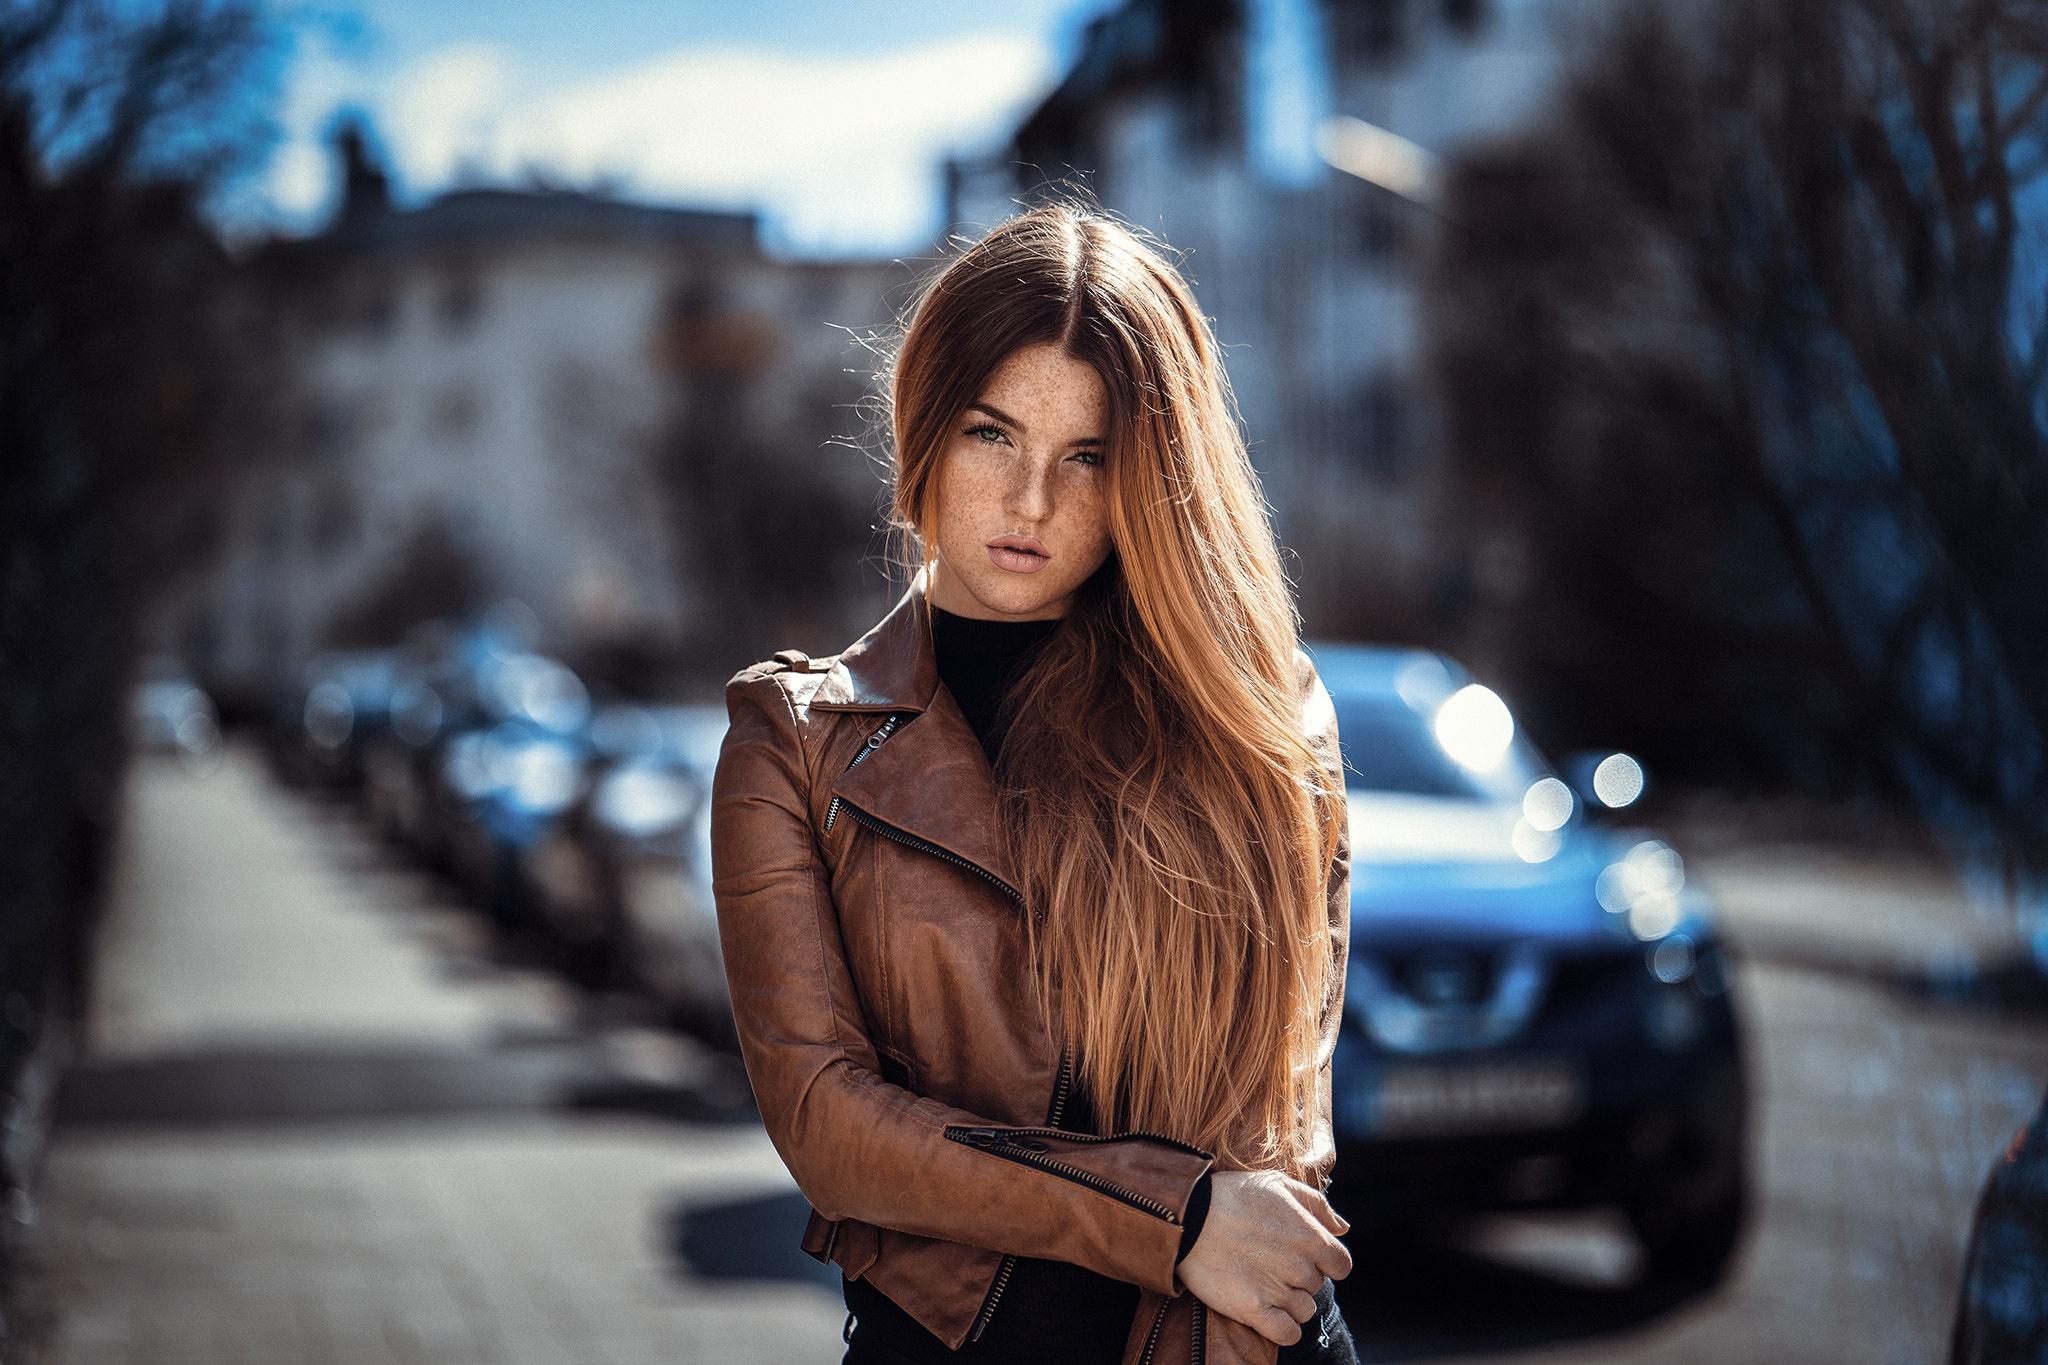 People 2048x1365 Anatoli Oskin women long hair urban model women outdoors brown jacket jacket leather jackets freckles frontal view Lara Vogel